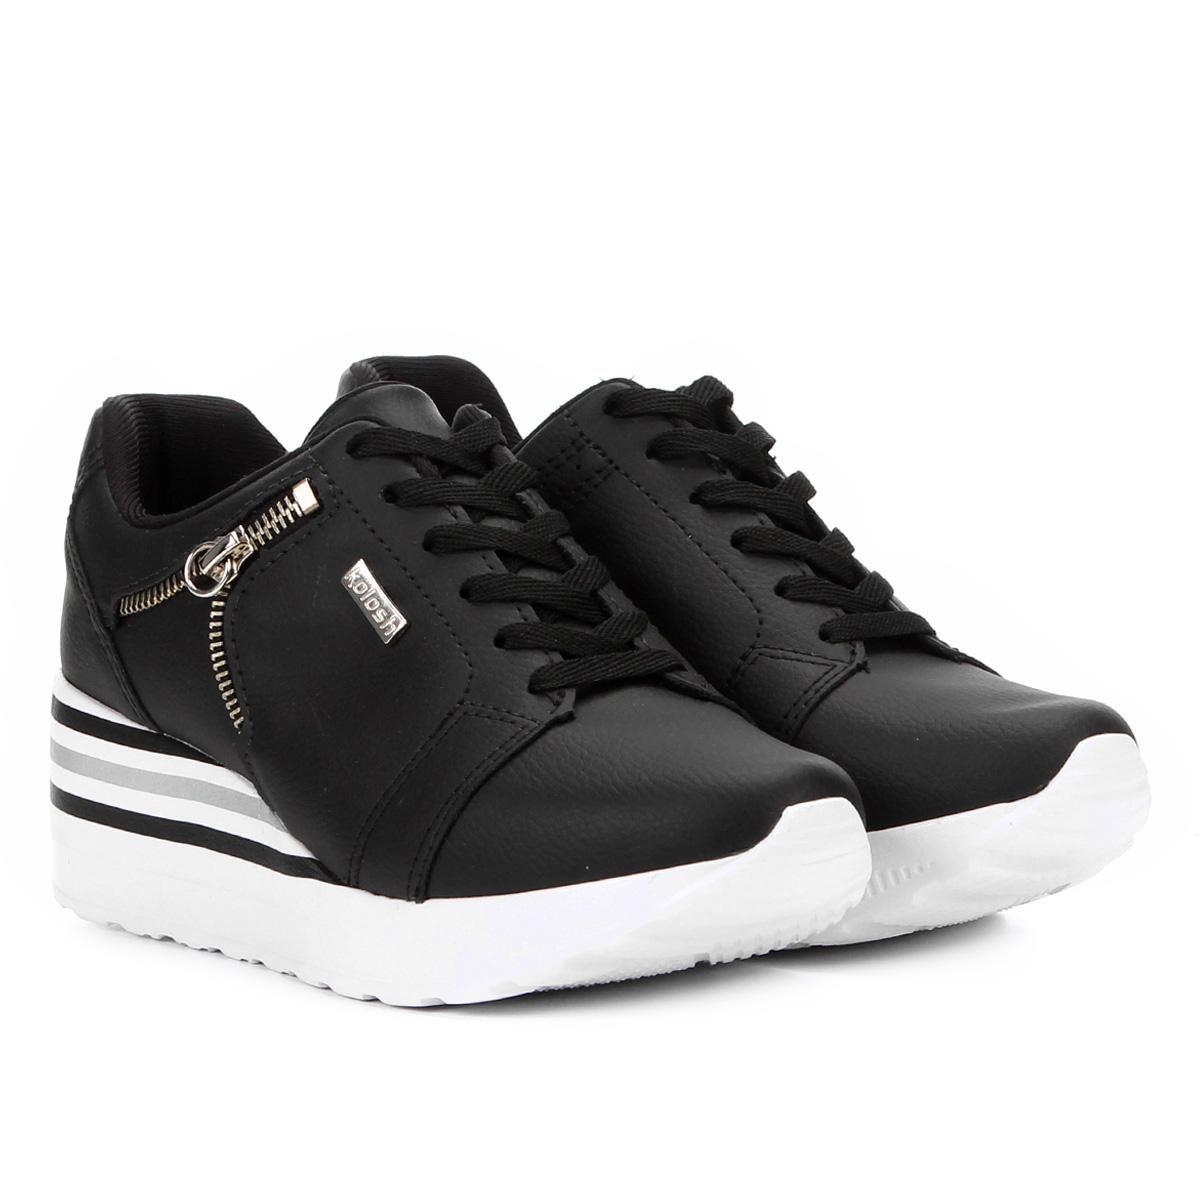 Tênis Kolosh Sneaker Anabela Zíper Lateral Feminina C1402